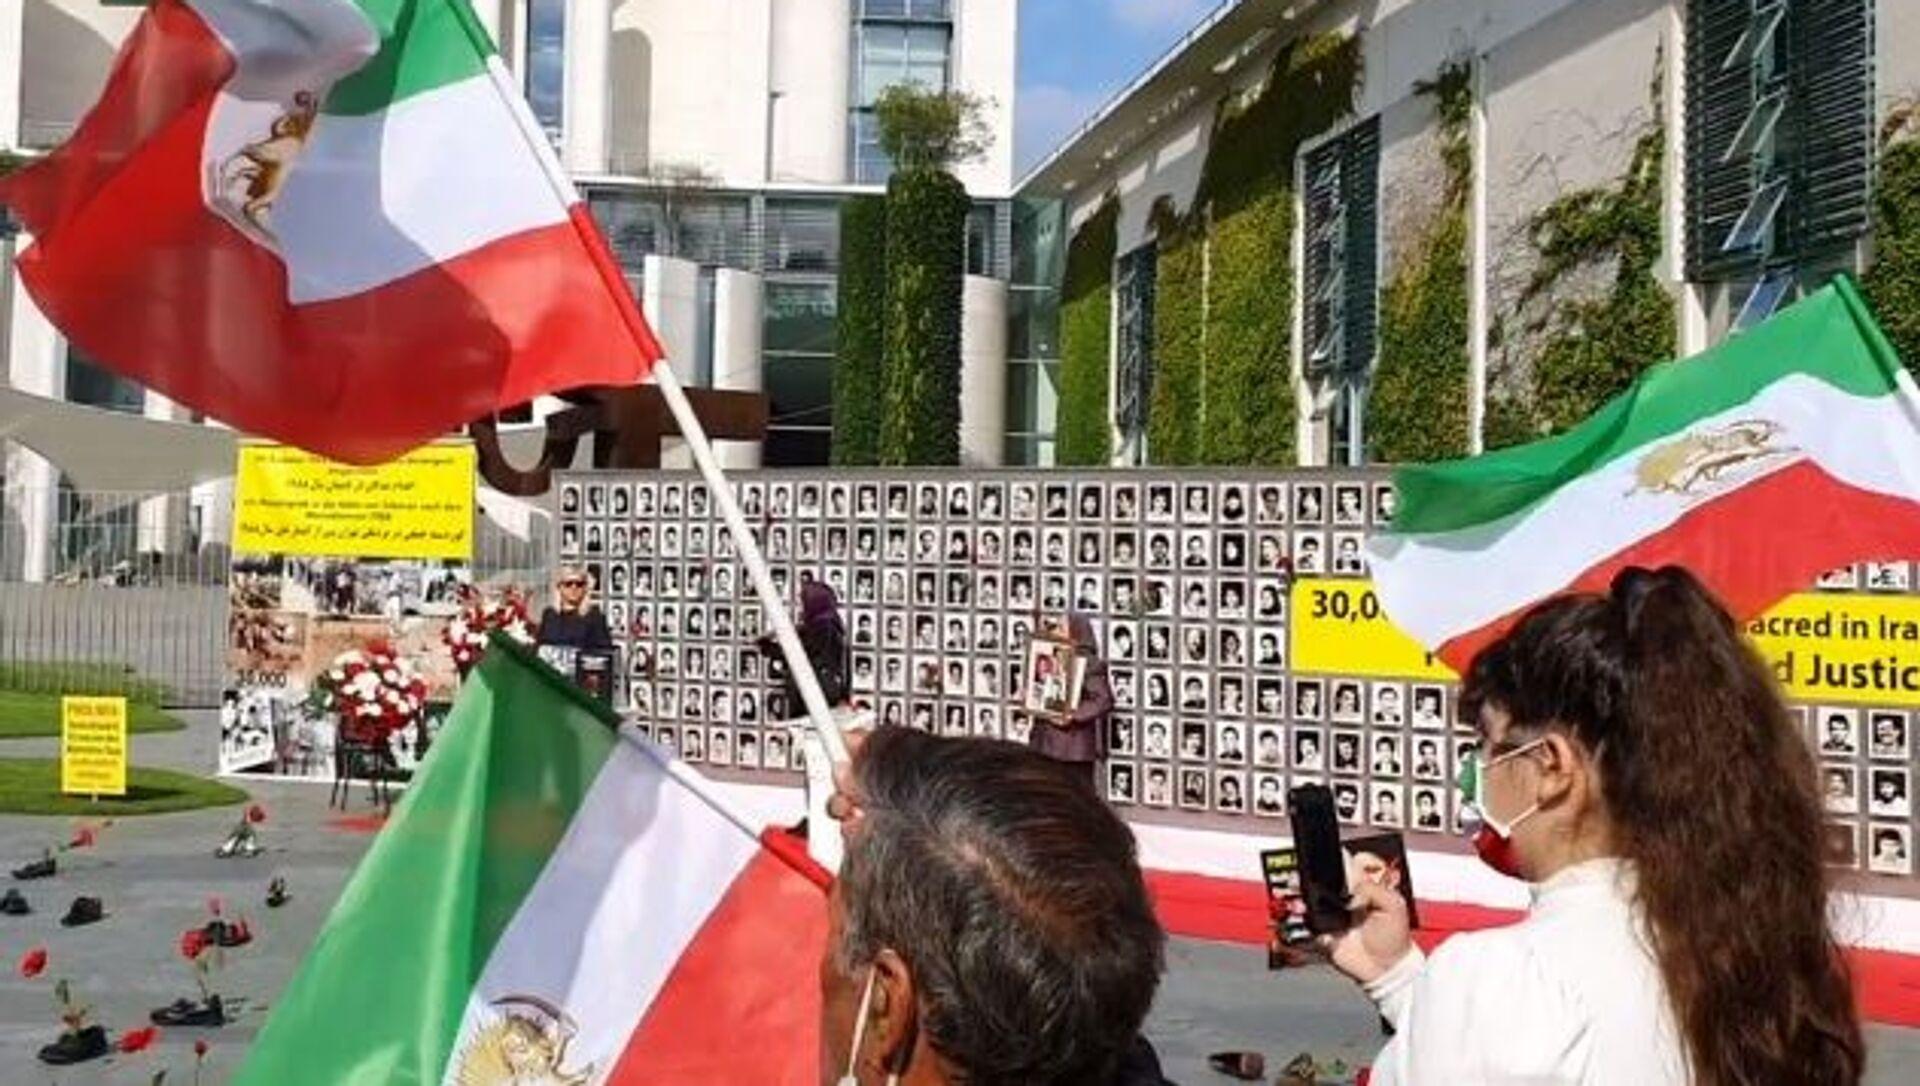 Rally in Support of Iran's Political Prisoners Held in Berlin Ahead of Raisi's Swearing In - Sputnik International, 1920, 03.08.2021